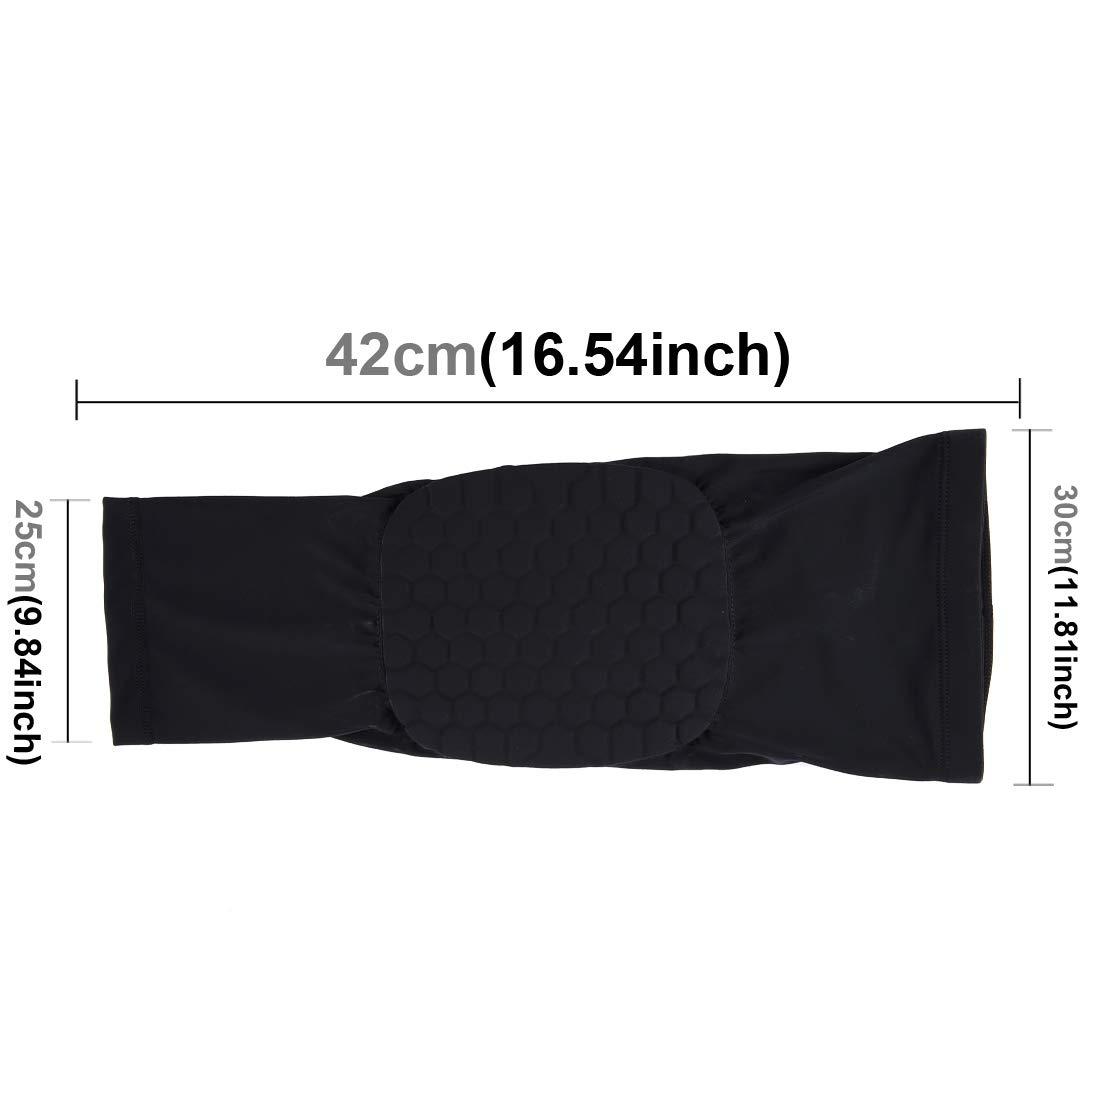 Anstorematealliance Sports&Entertainment Sports&Entertainment Factory 1 PC Beehive Shaped Sports Collision-Resistant Lycra Elastic Knee Support Guard, Long Version, Size: M(Black) (Color : Black)